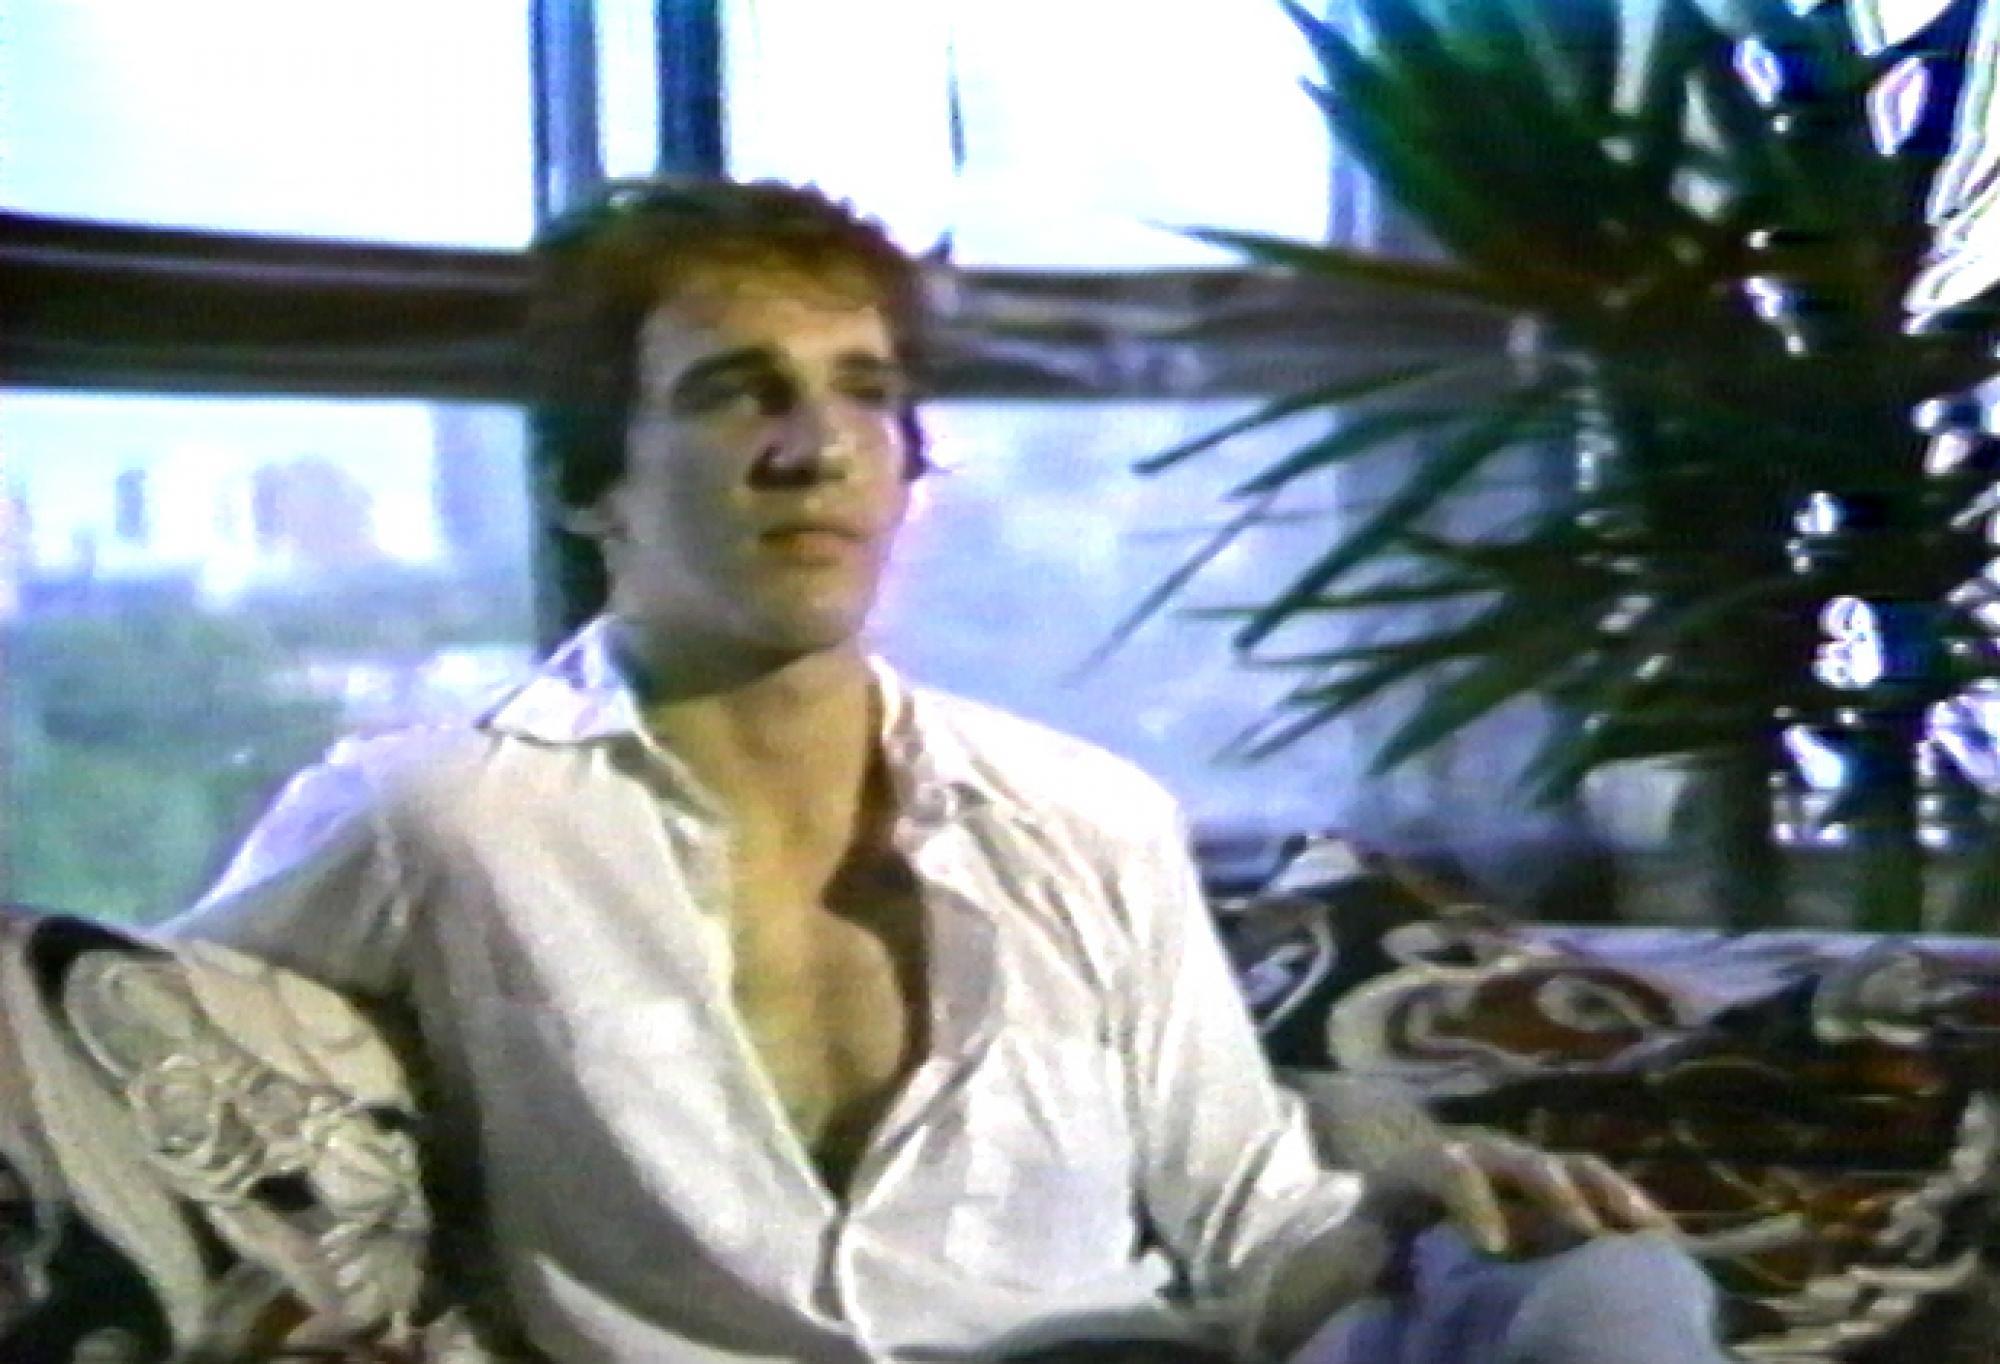 [ Fig. 27 ] <i>Le voyage de l'ogre / The Path of the Ogre</i> (video still), 1981.